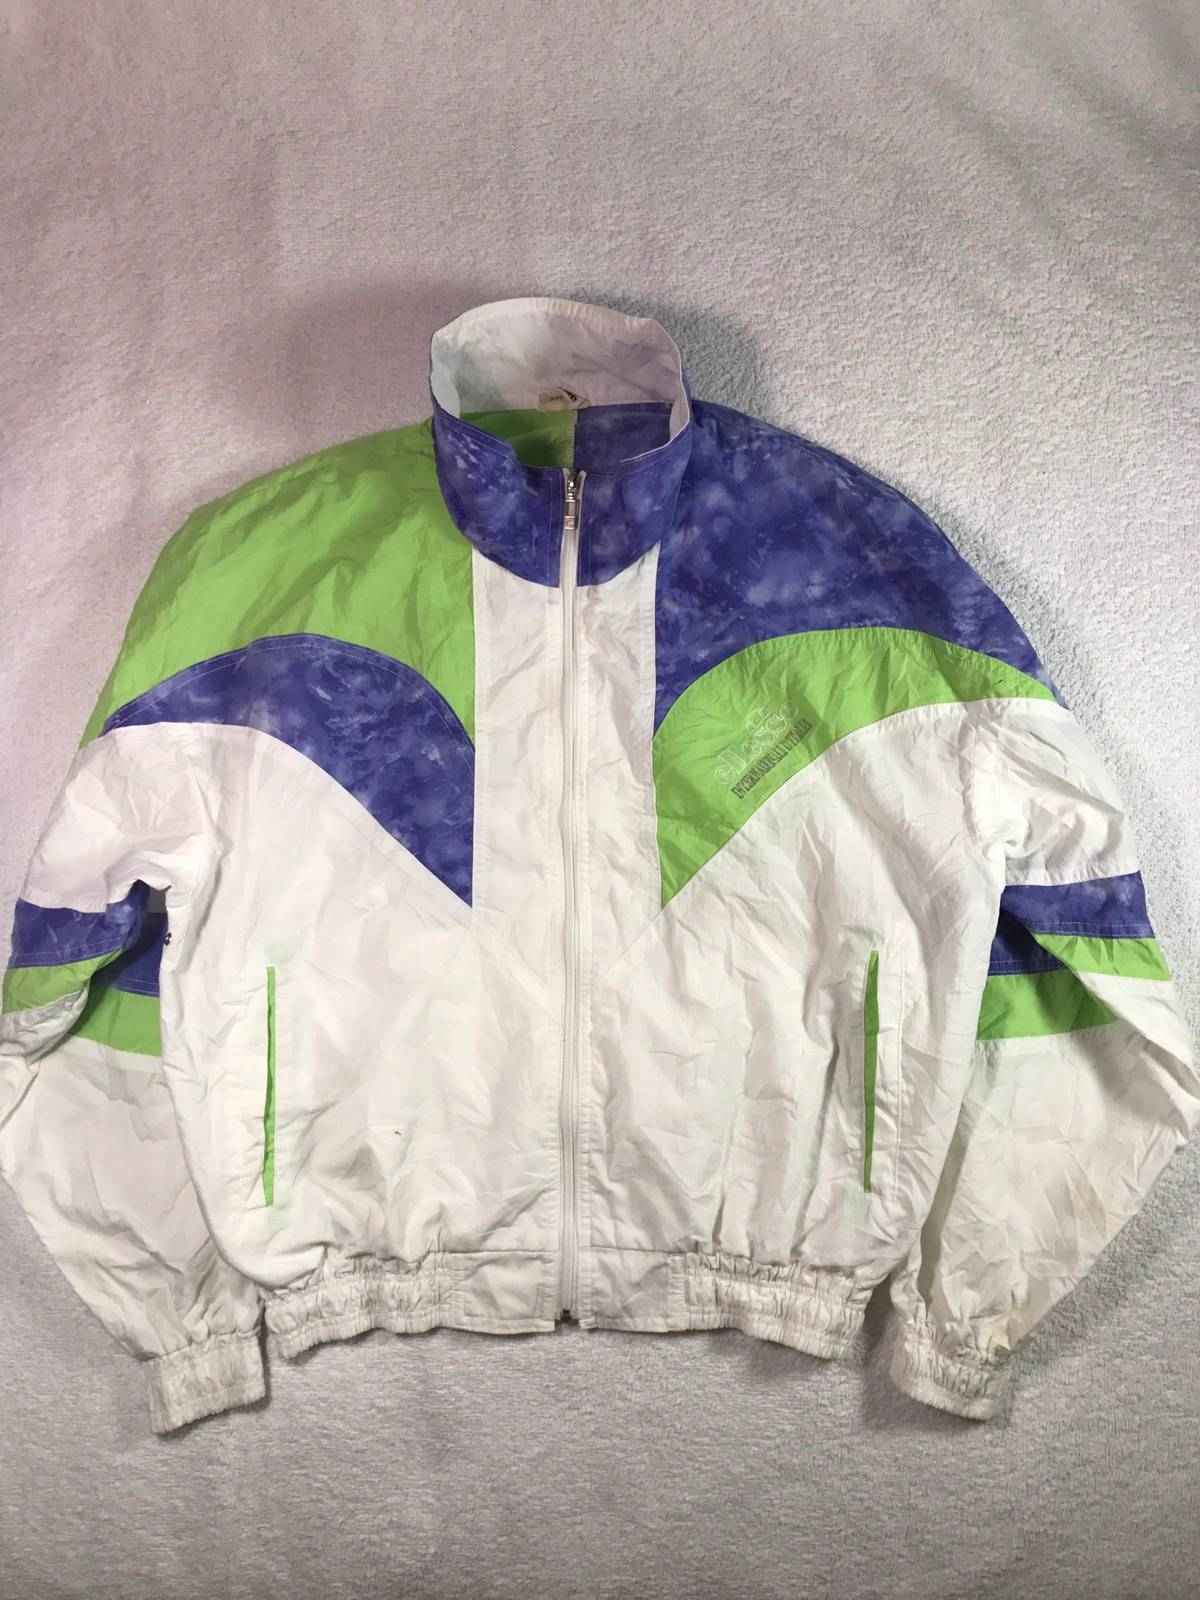 Vintage Jacket Ellesse Anno Italy Multicolor Spellout Jacket Nice Design Medium Size Rare!!